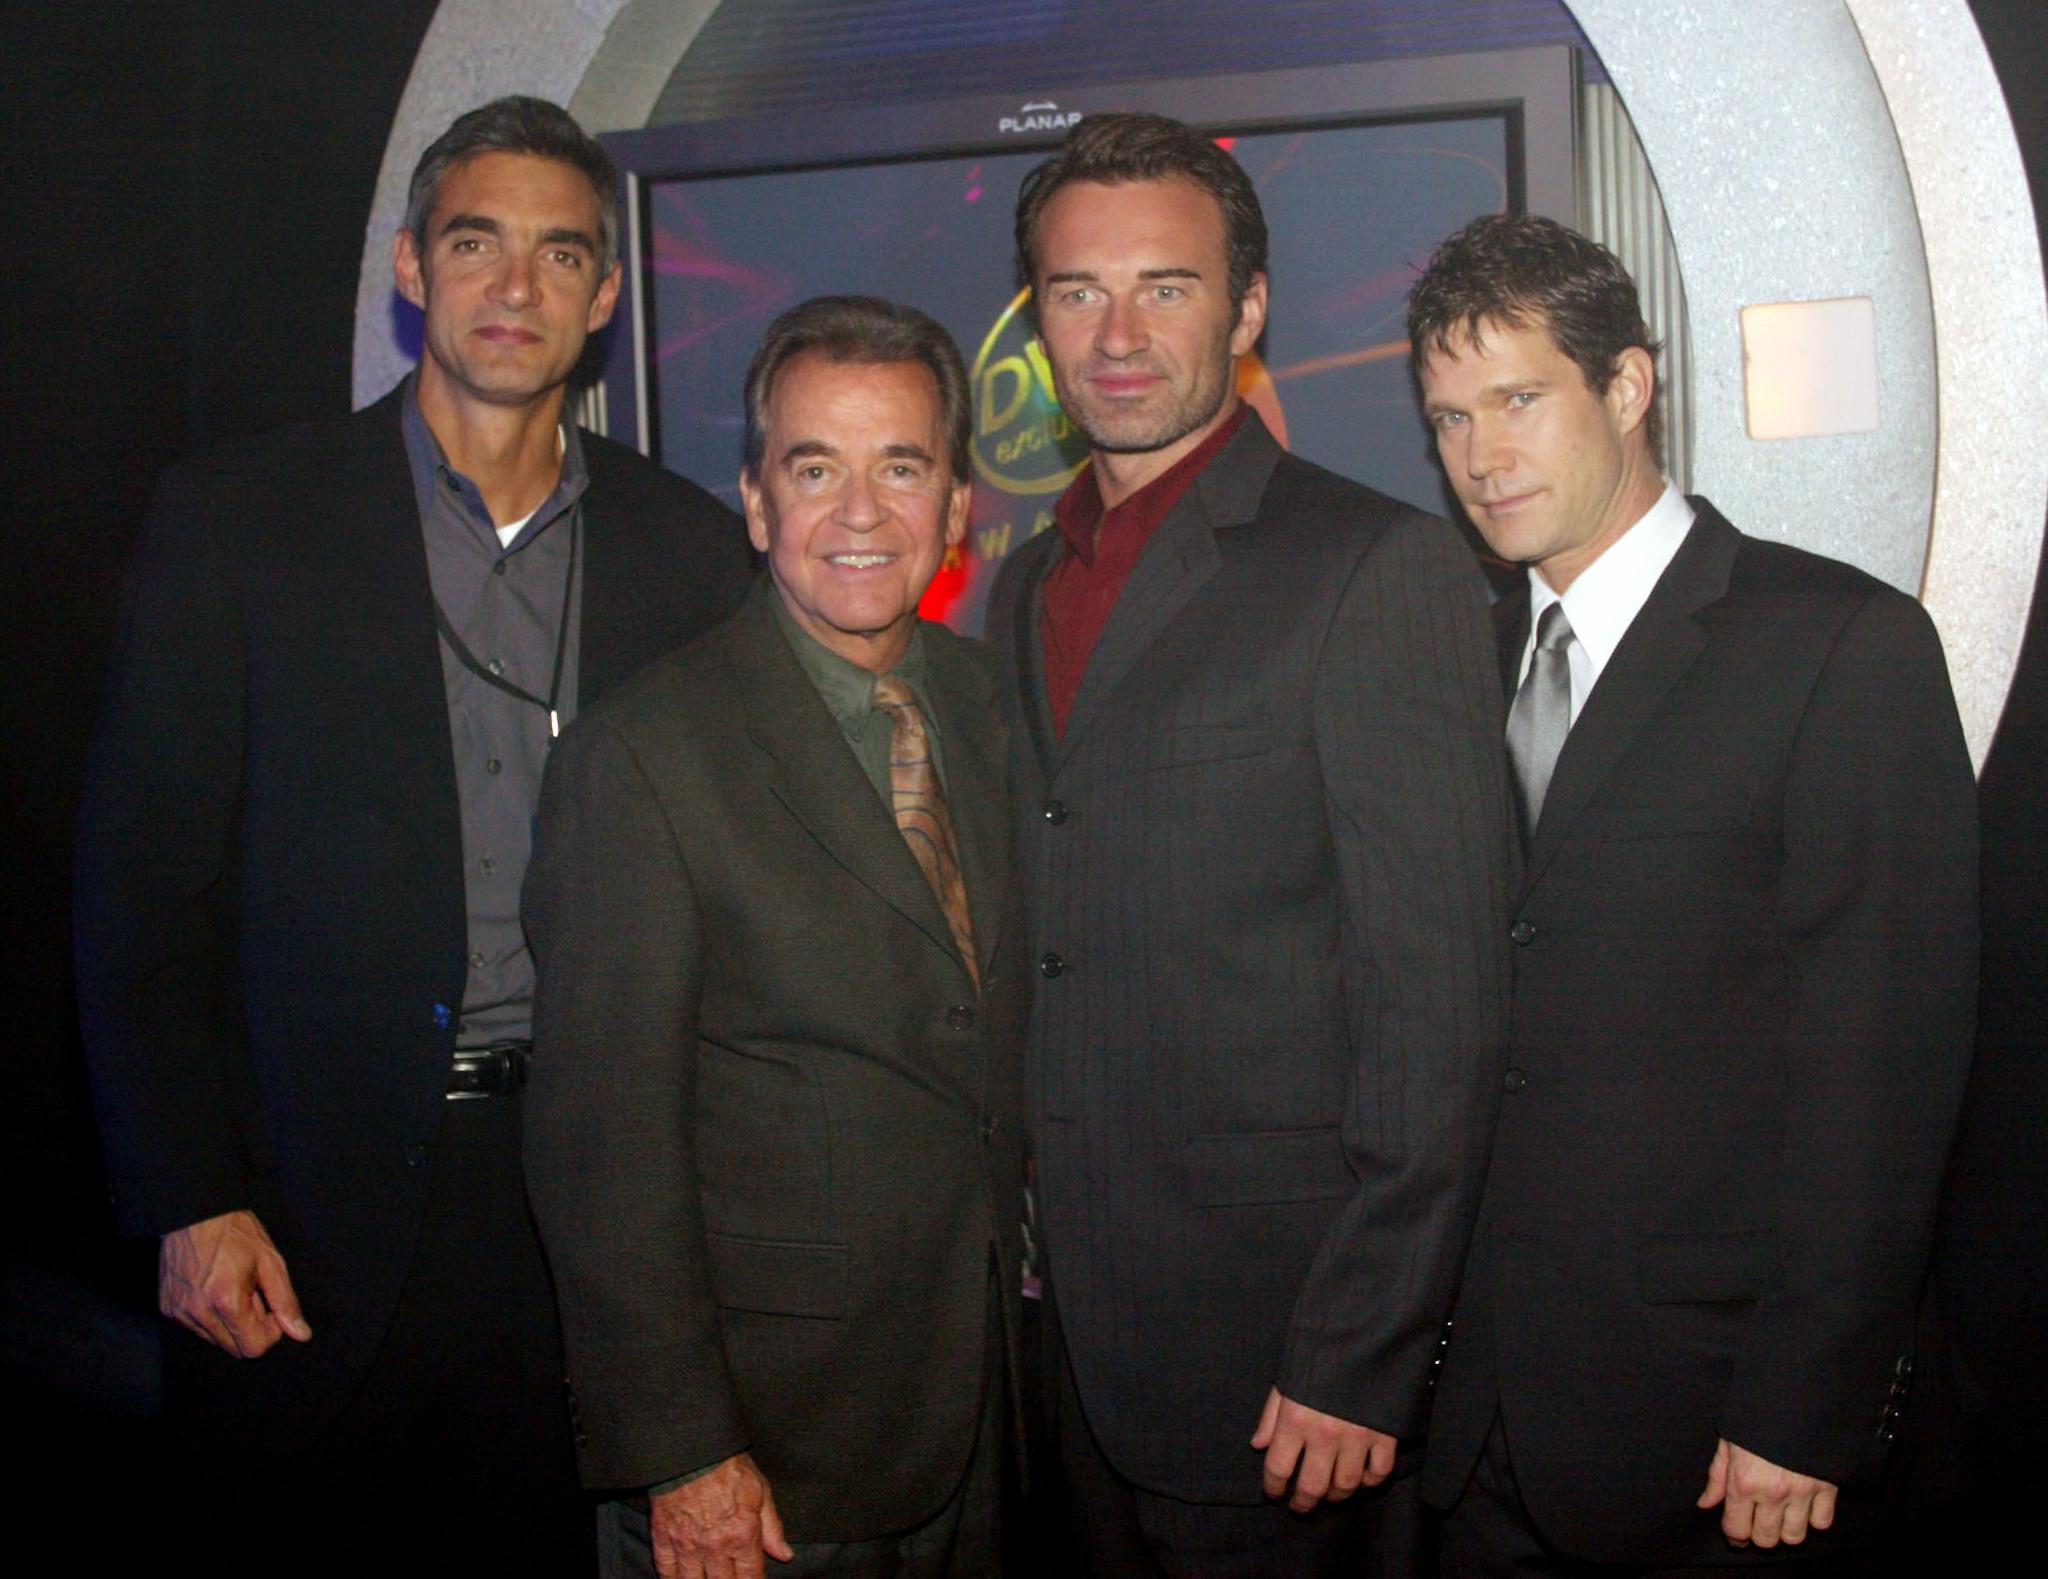 Dick Clark, Peter Liguori, Julian McMahon, and Dylan Walsh